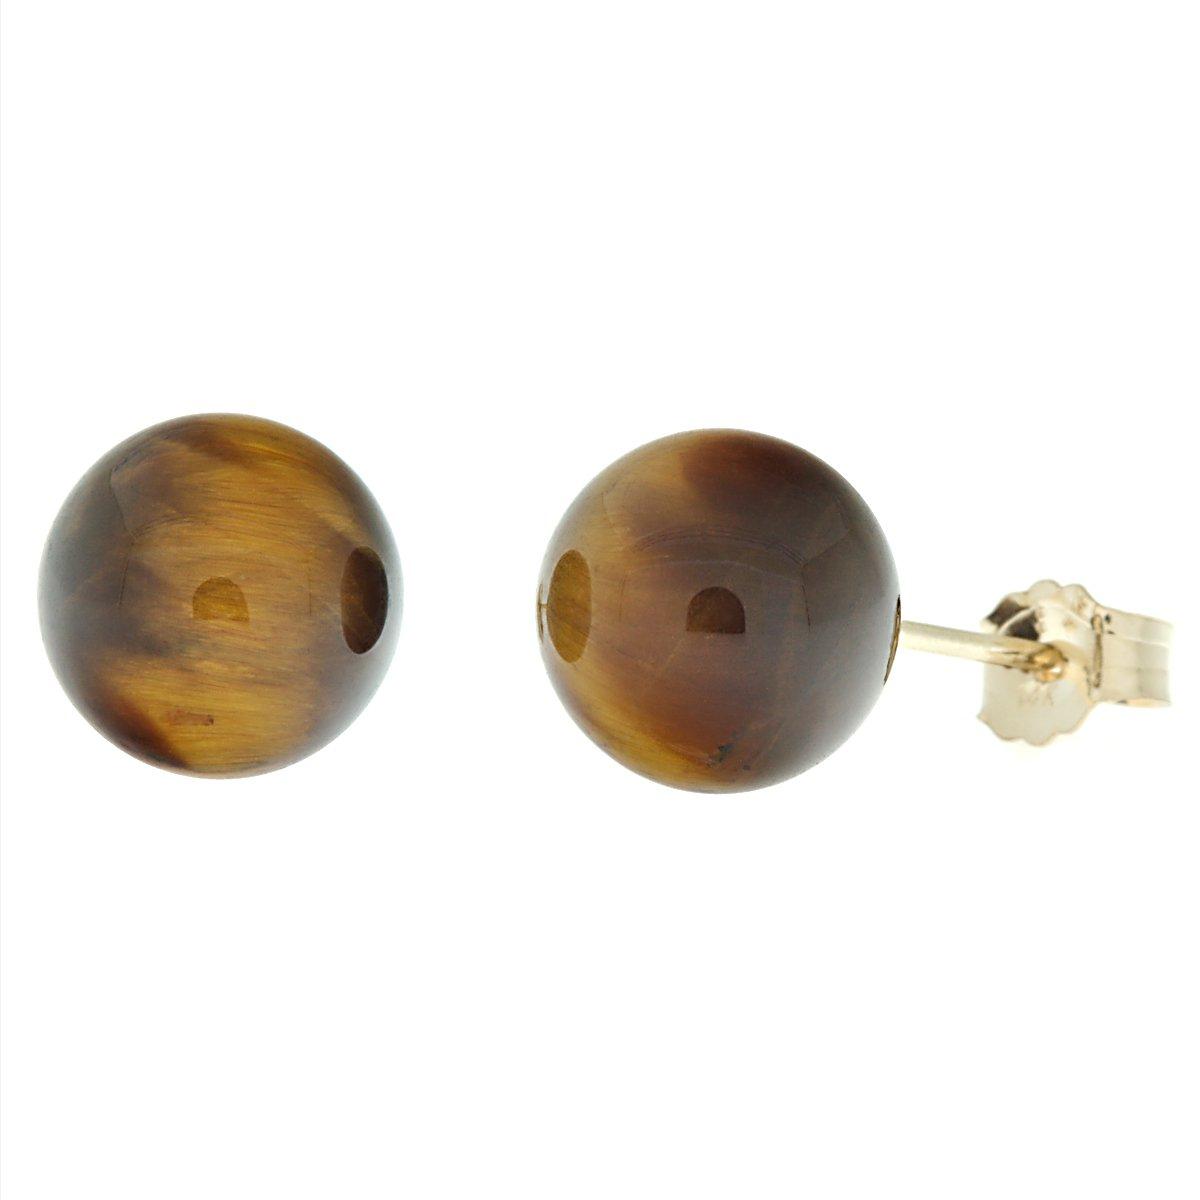 Trustmark 14K Yellow Gold 8mm Natural Brown Tigers Eye Ball Stud Post Earrings